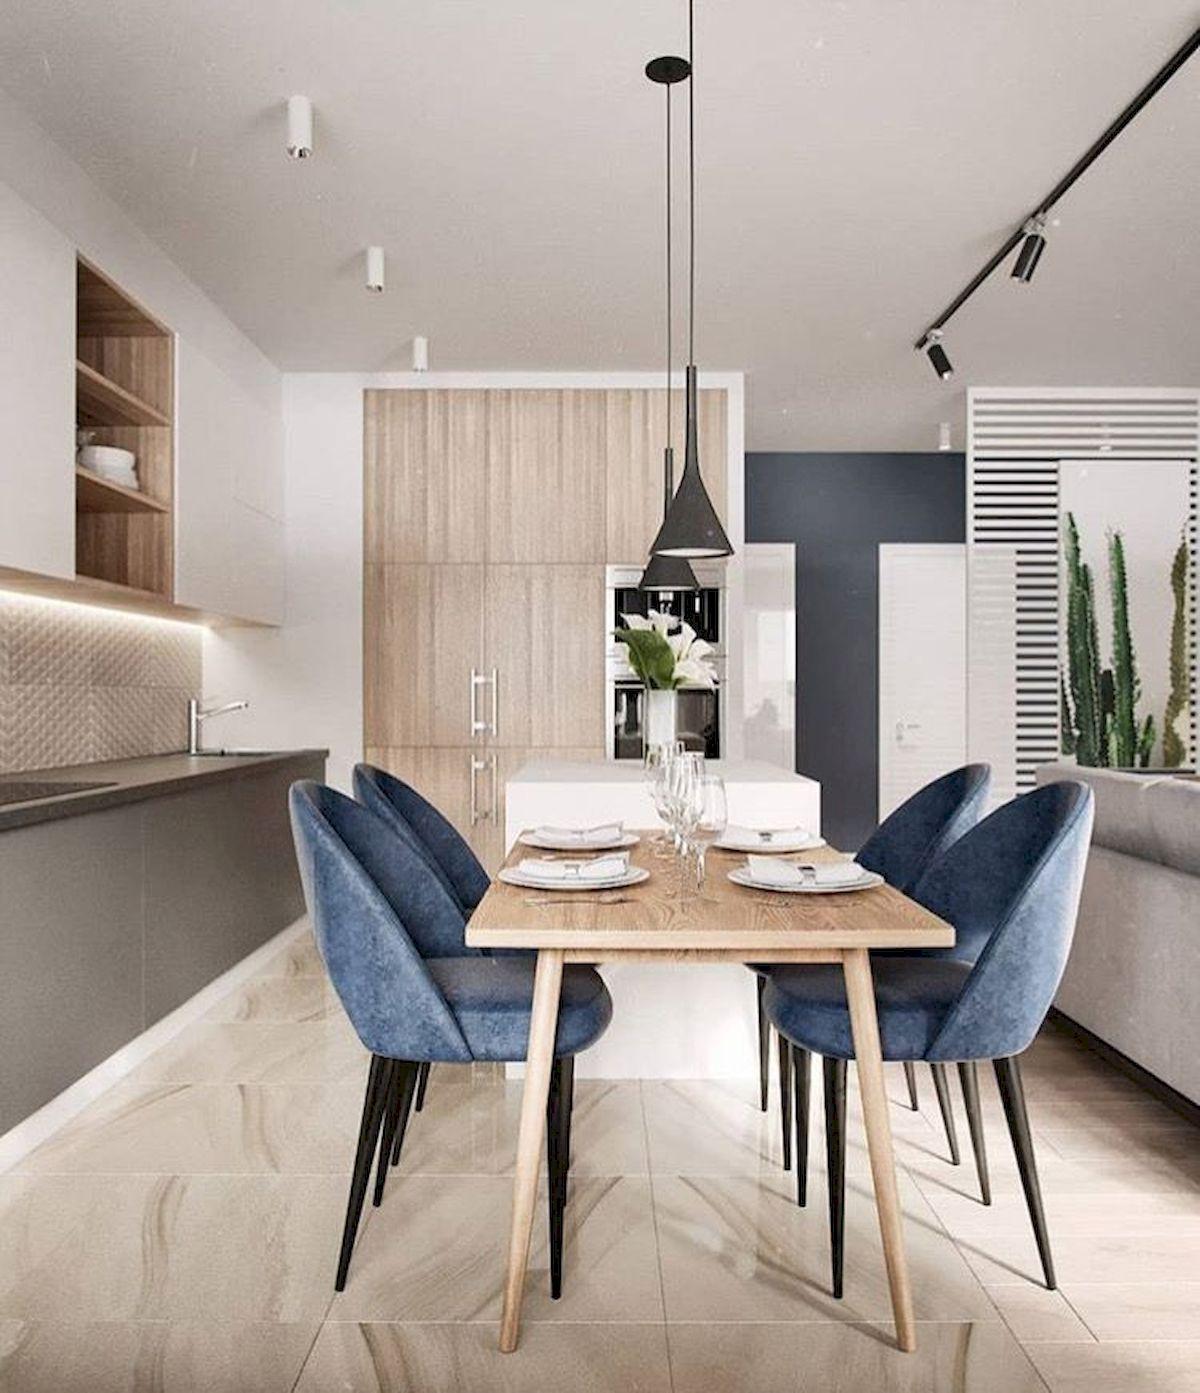 30 Minimalist But Luxurious Kitchen Design 5 Jihanshanum Dining Room Design Luxury Dining Room Minimalist Dining Room